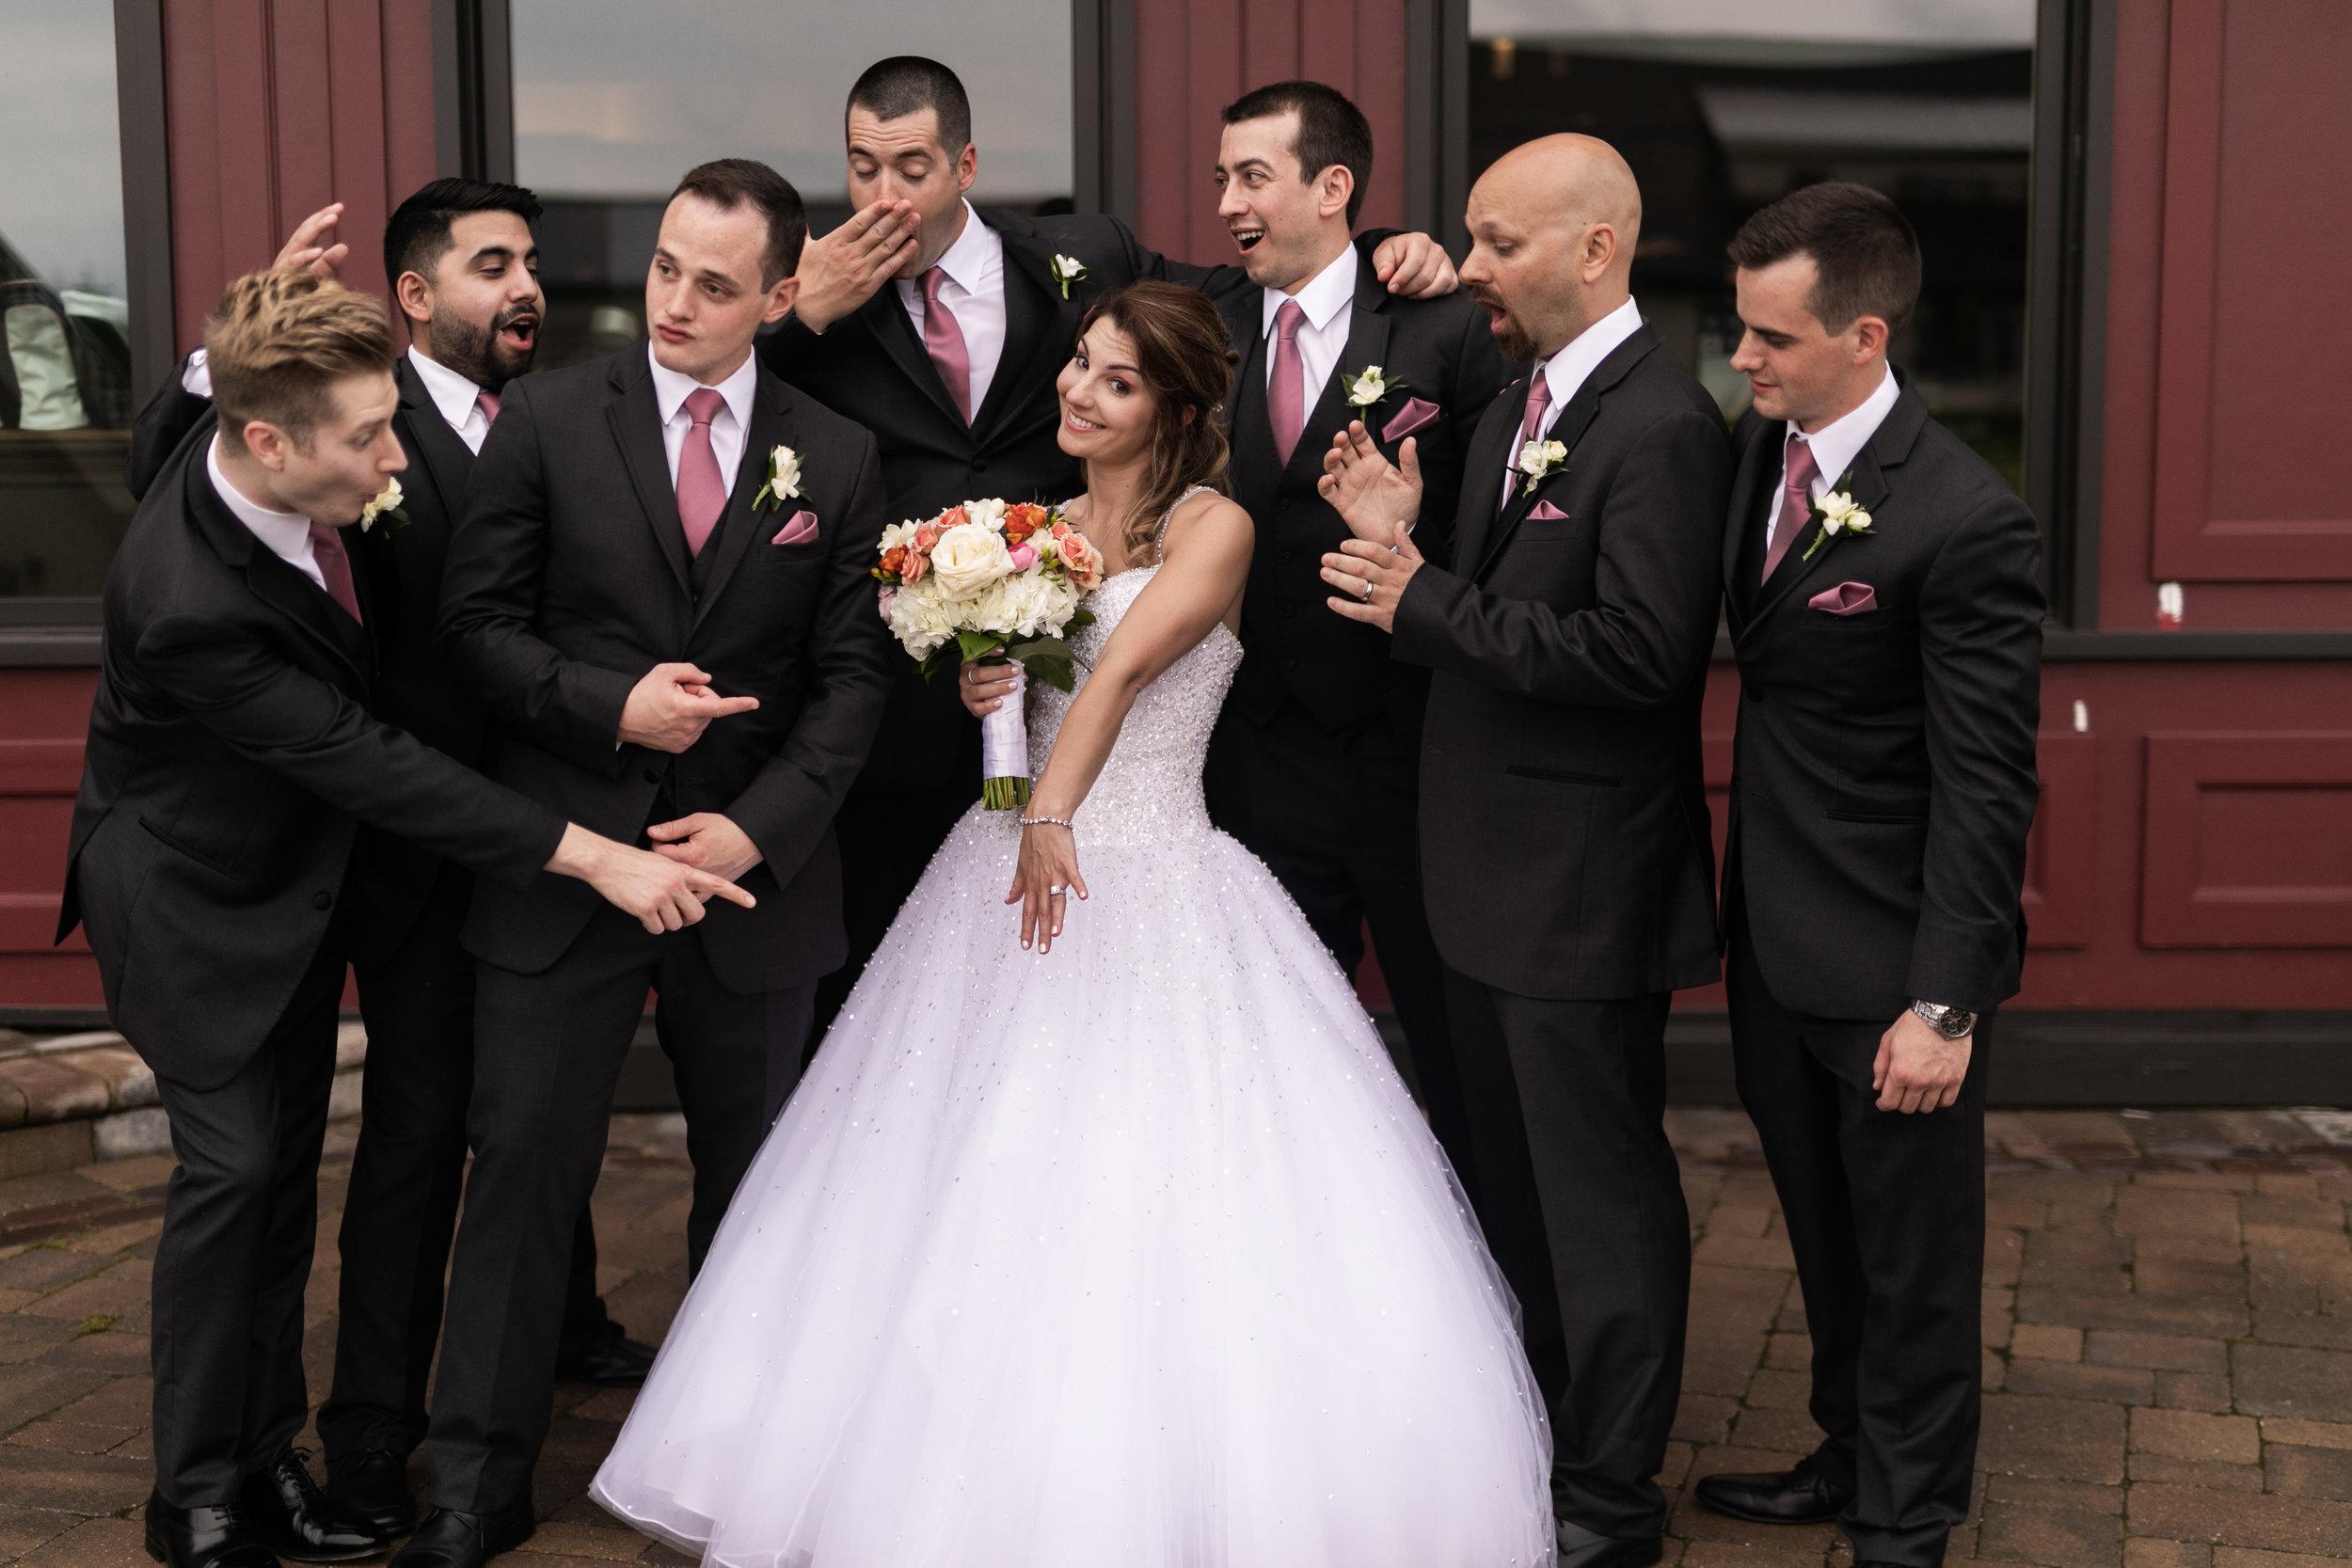 Wedding-couple-takes-photos-at-lowes-hardware-due-to-rain5.jpg